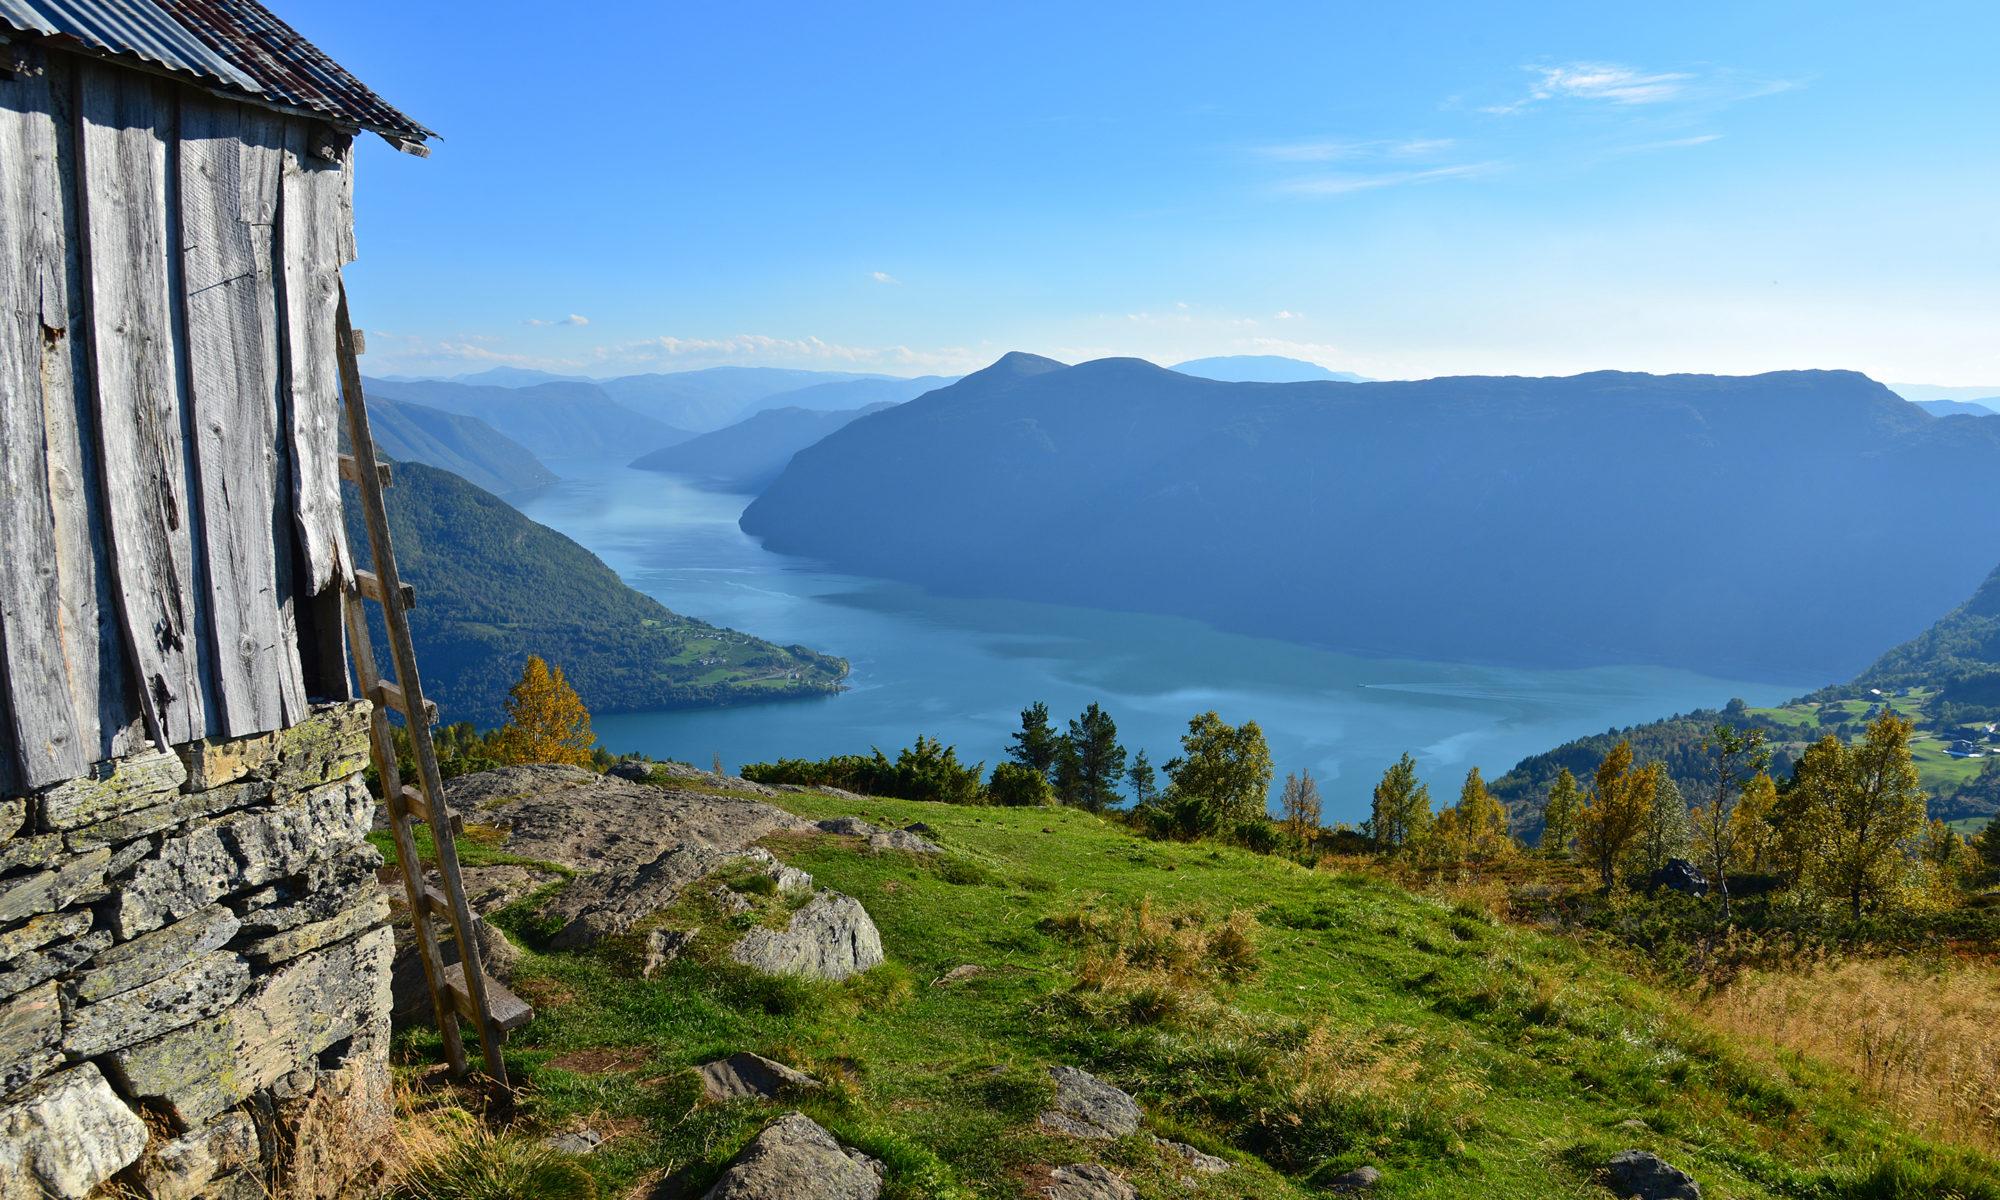 The Lustrafjord seen from Svarthiller at Molden. Luster, Norway